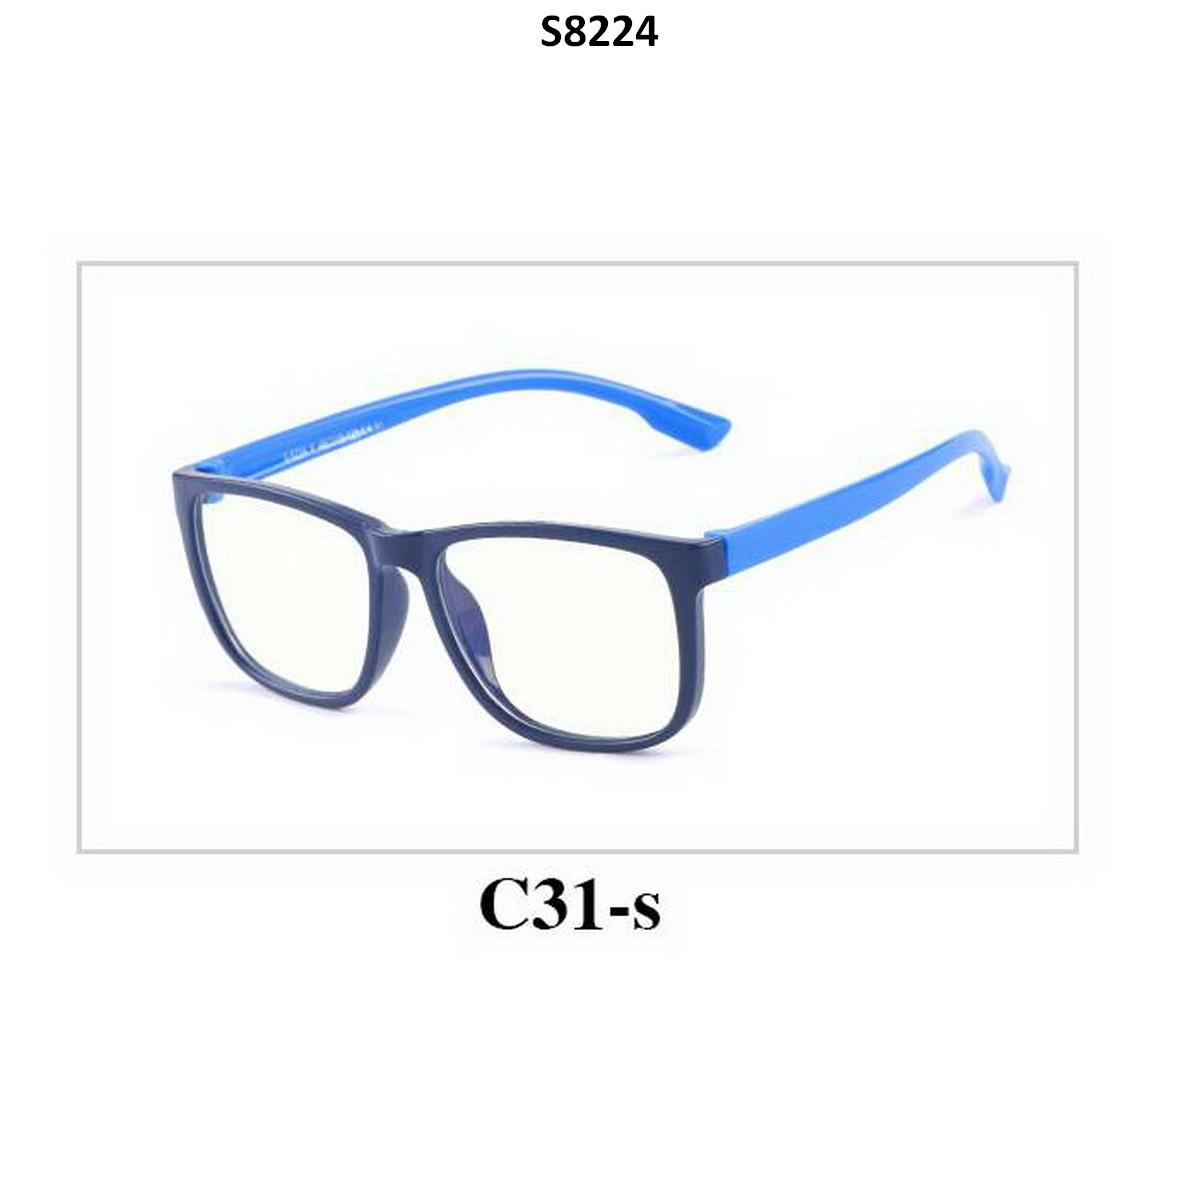 Kids Blue Light Blocker Computer Glasses Anti Blue Ray Eyeglasses S8224C31